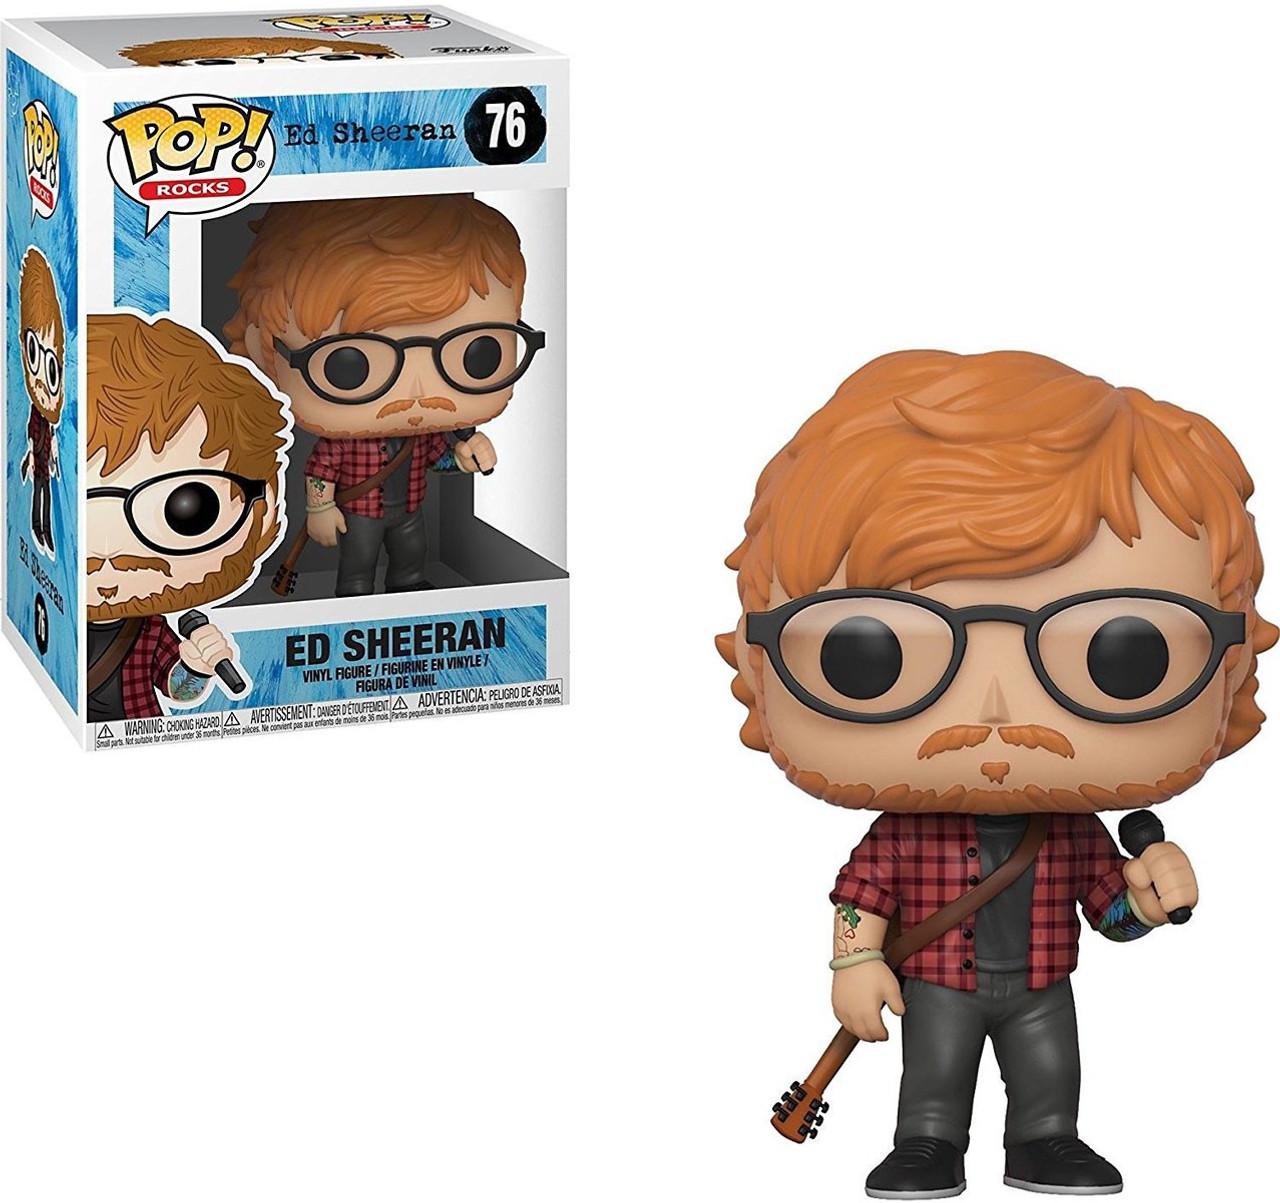 Funko POP! Rocks Ed Sheeran Vinyl Figure #76